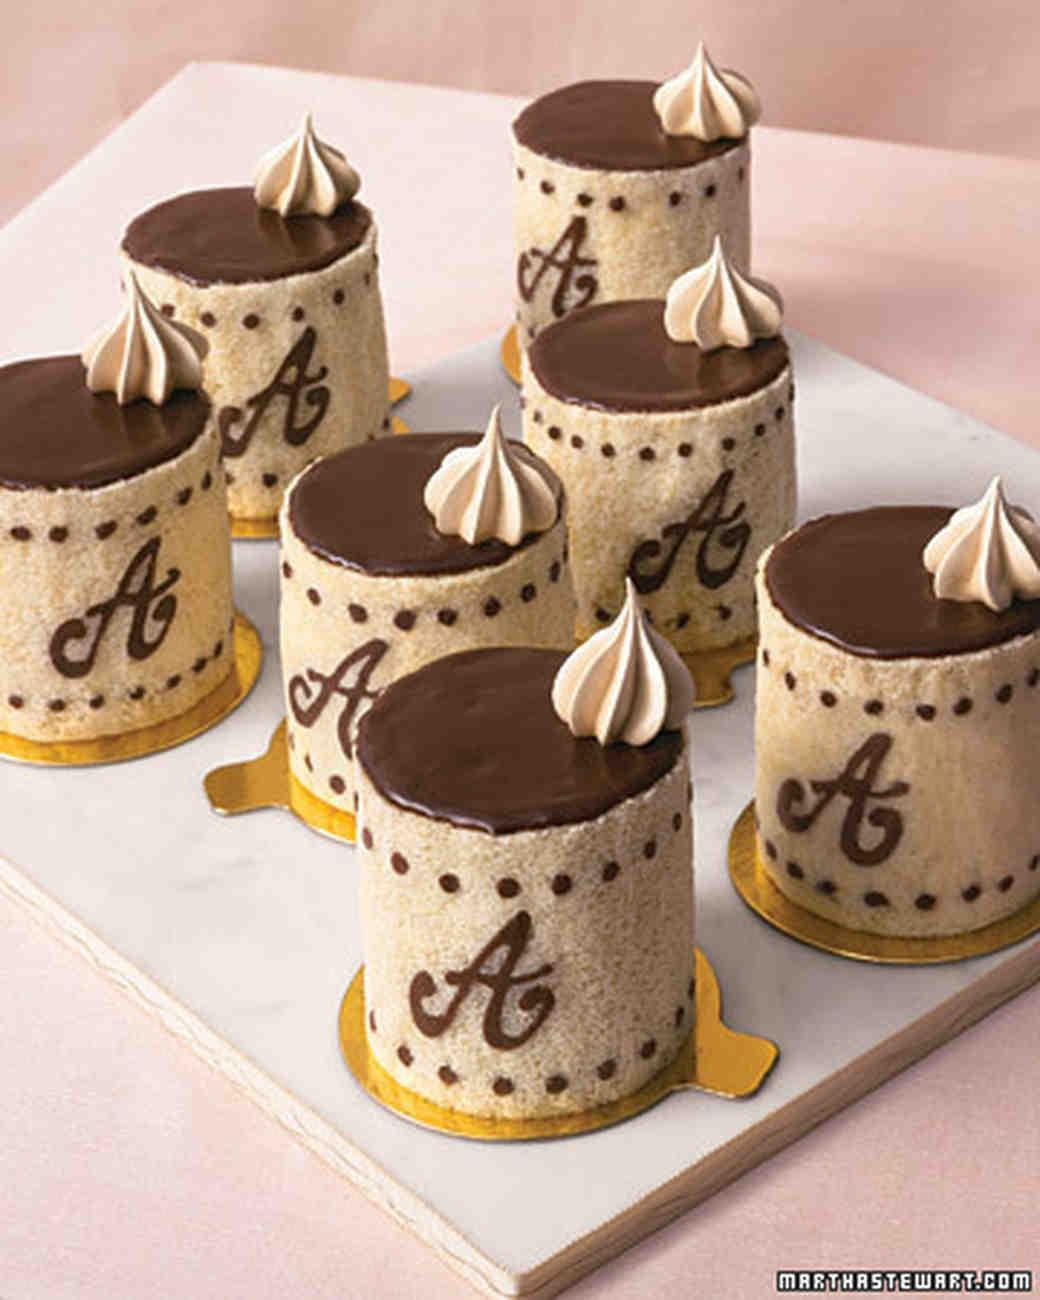 Individual Chocolate-Espresso Charlottes